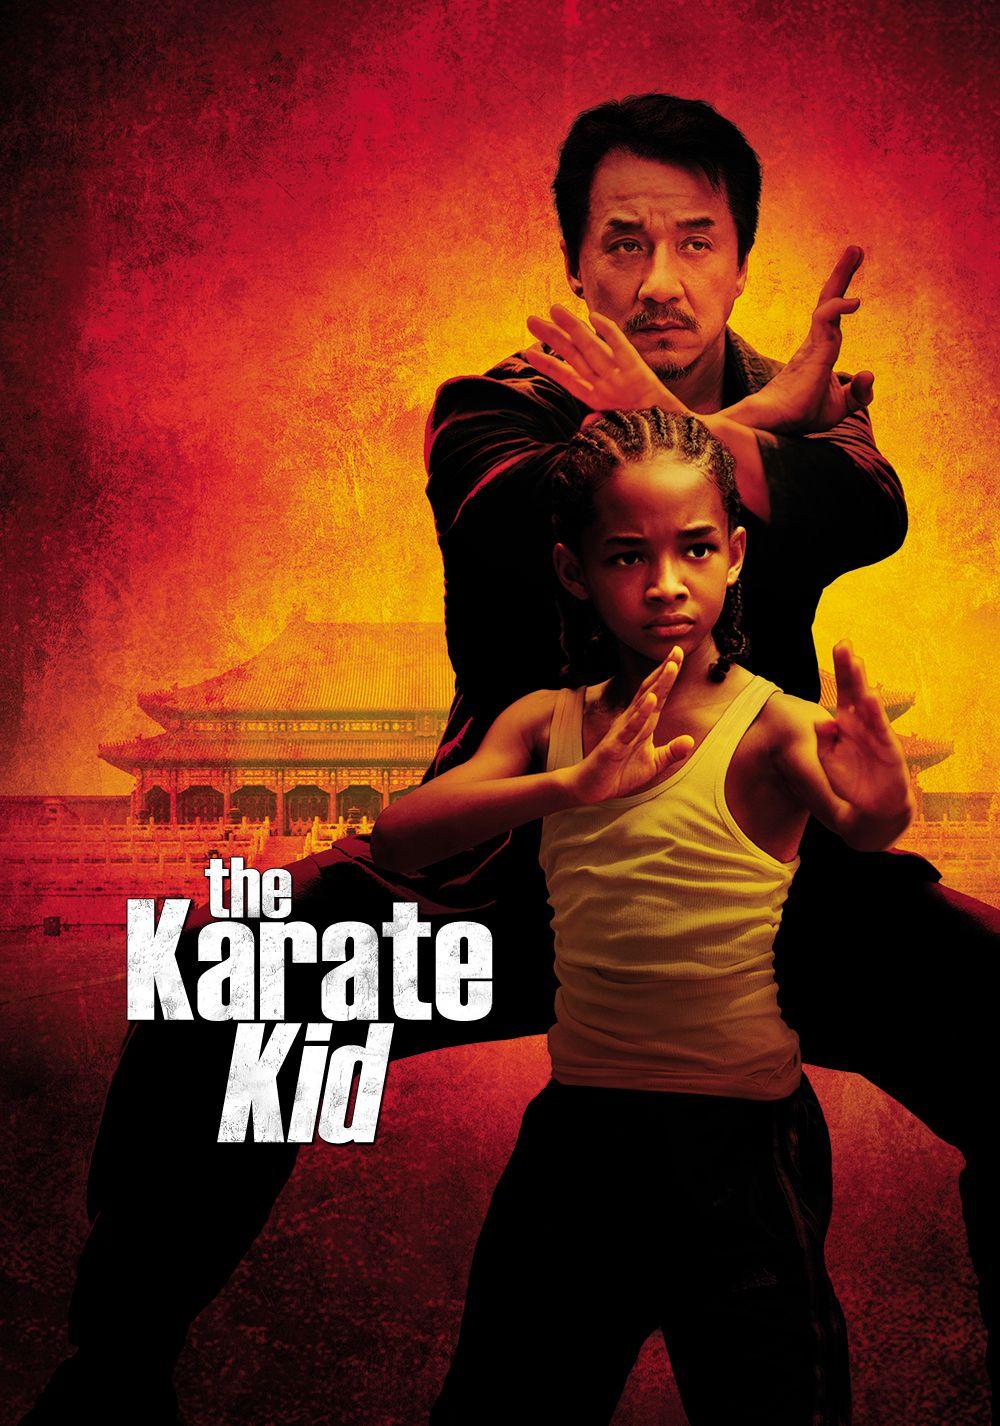 The Karate Kid 2010 Tamil Dubbed Hd Karate Kid 2010 Karate Kid Karate Kid Movie